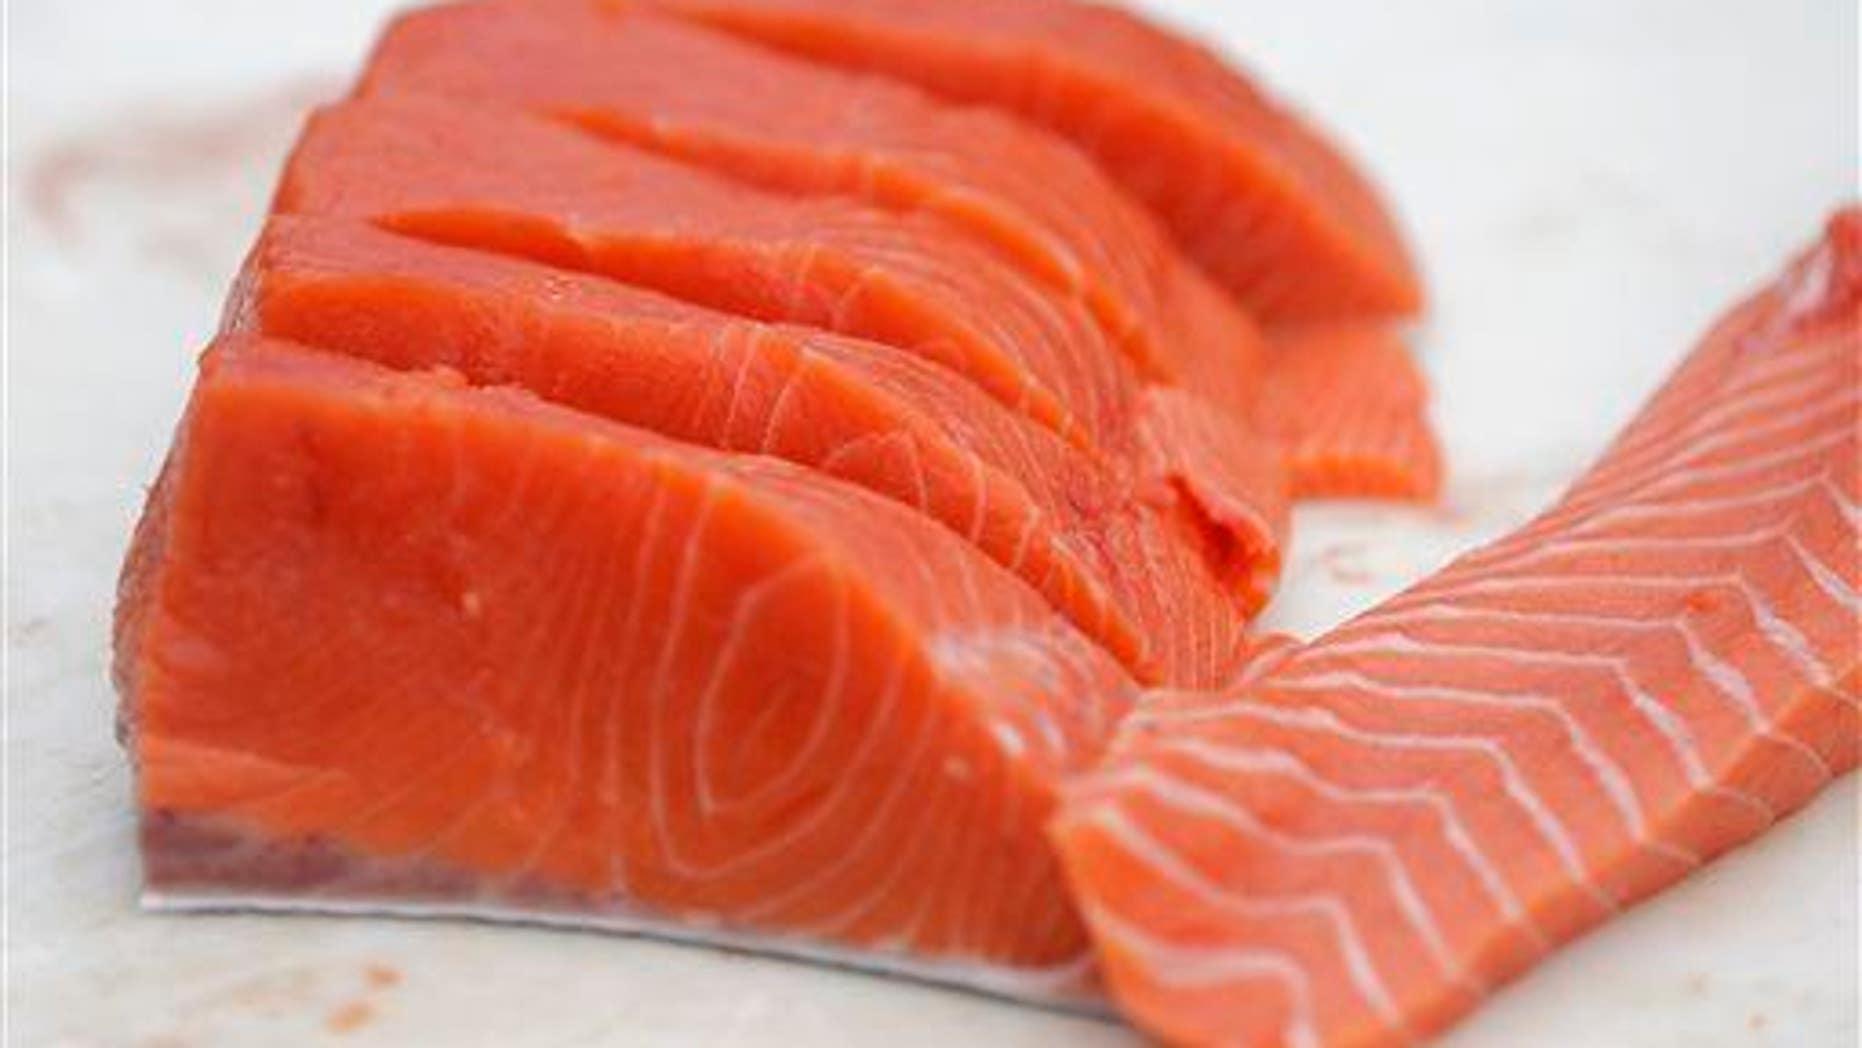 Mmm, omega-3 fatty acids.